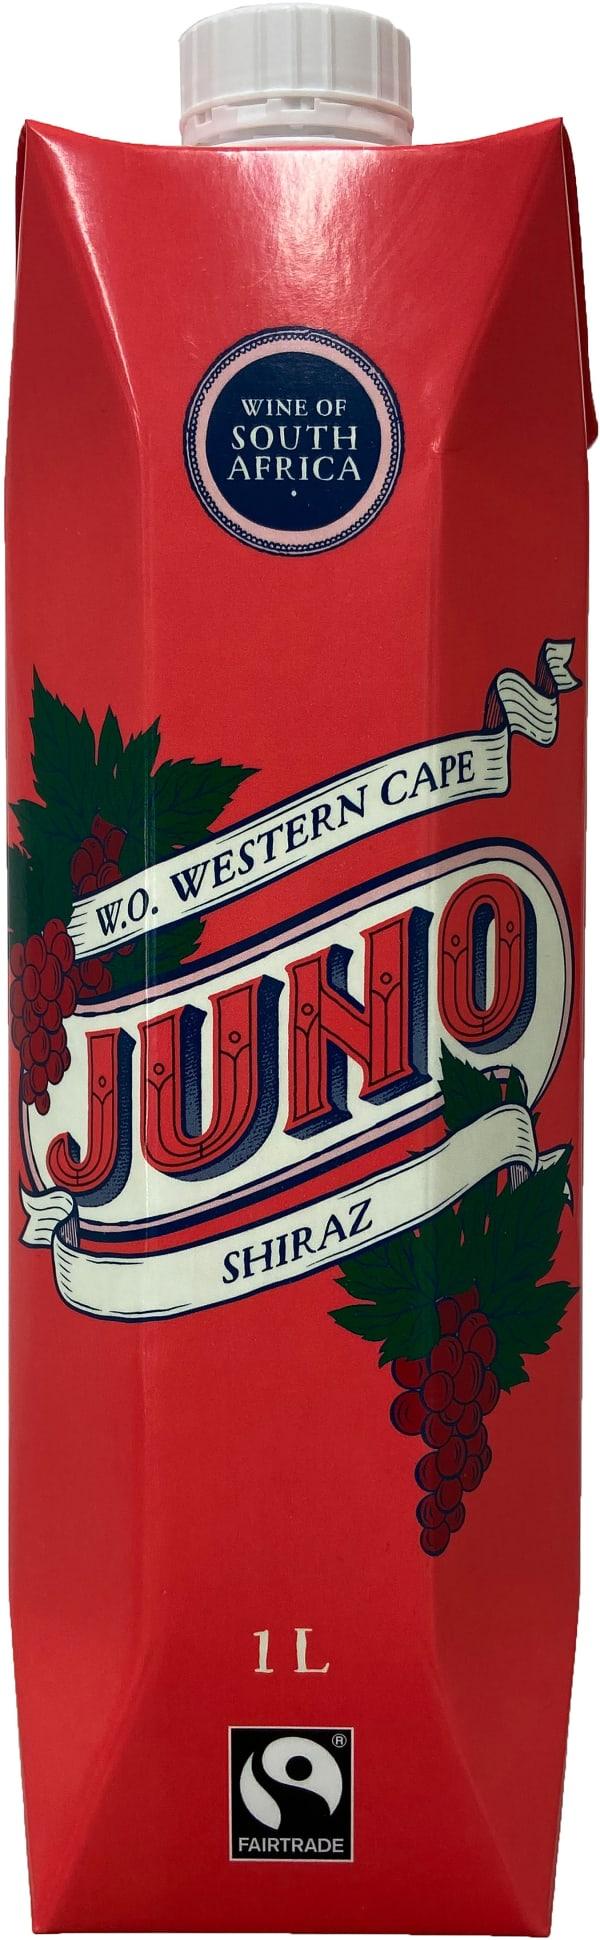 Juno Shiraz 2017 kartongförpackning